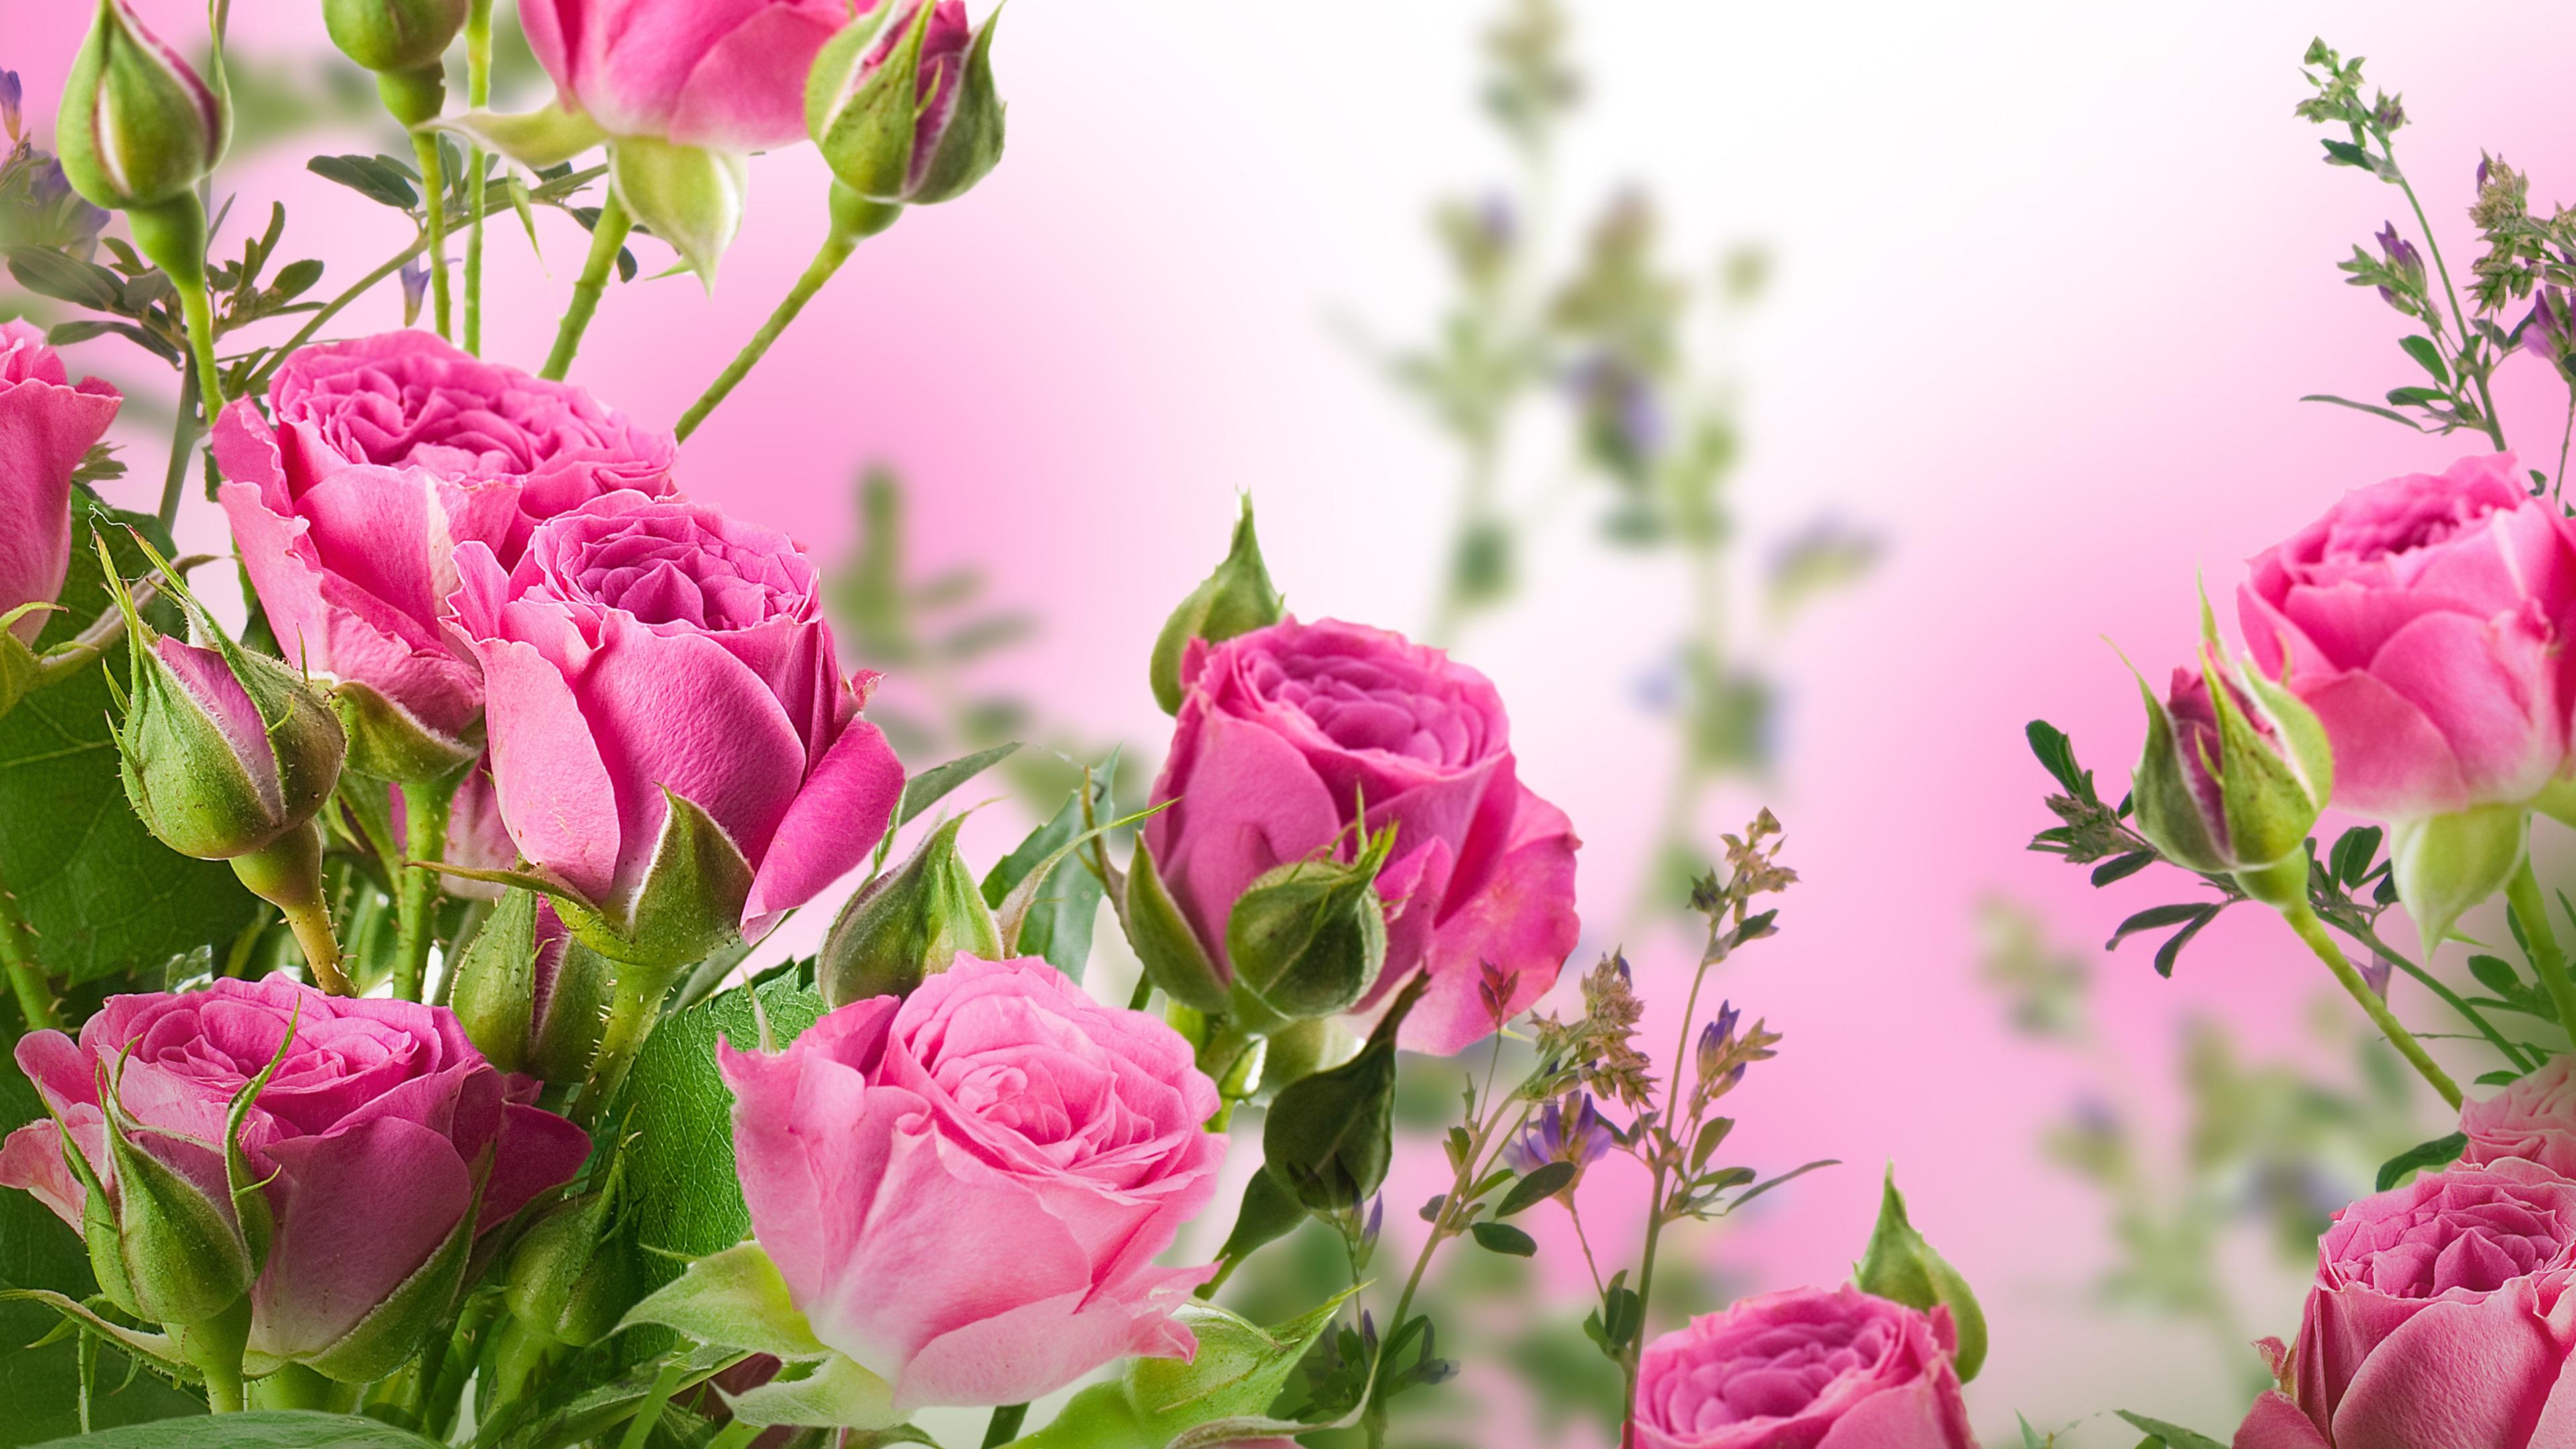 Wallpaper Pink Rose Flowers Garden 3840x2160 Uhd 4k Picture Image